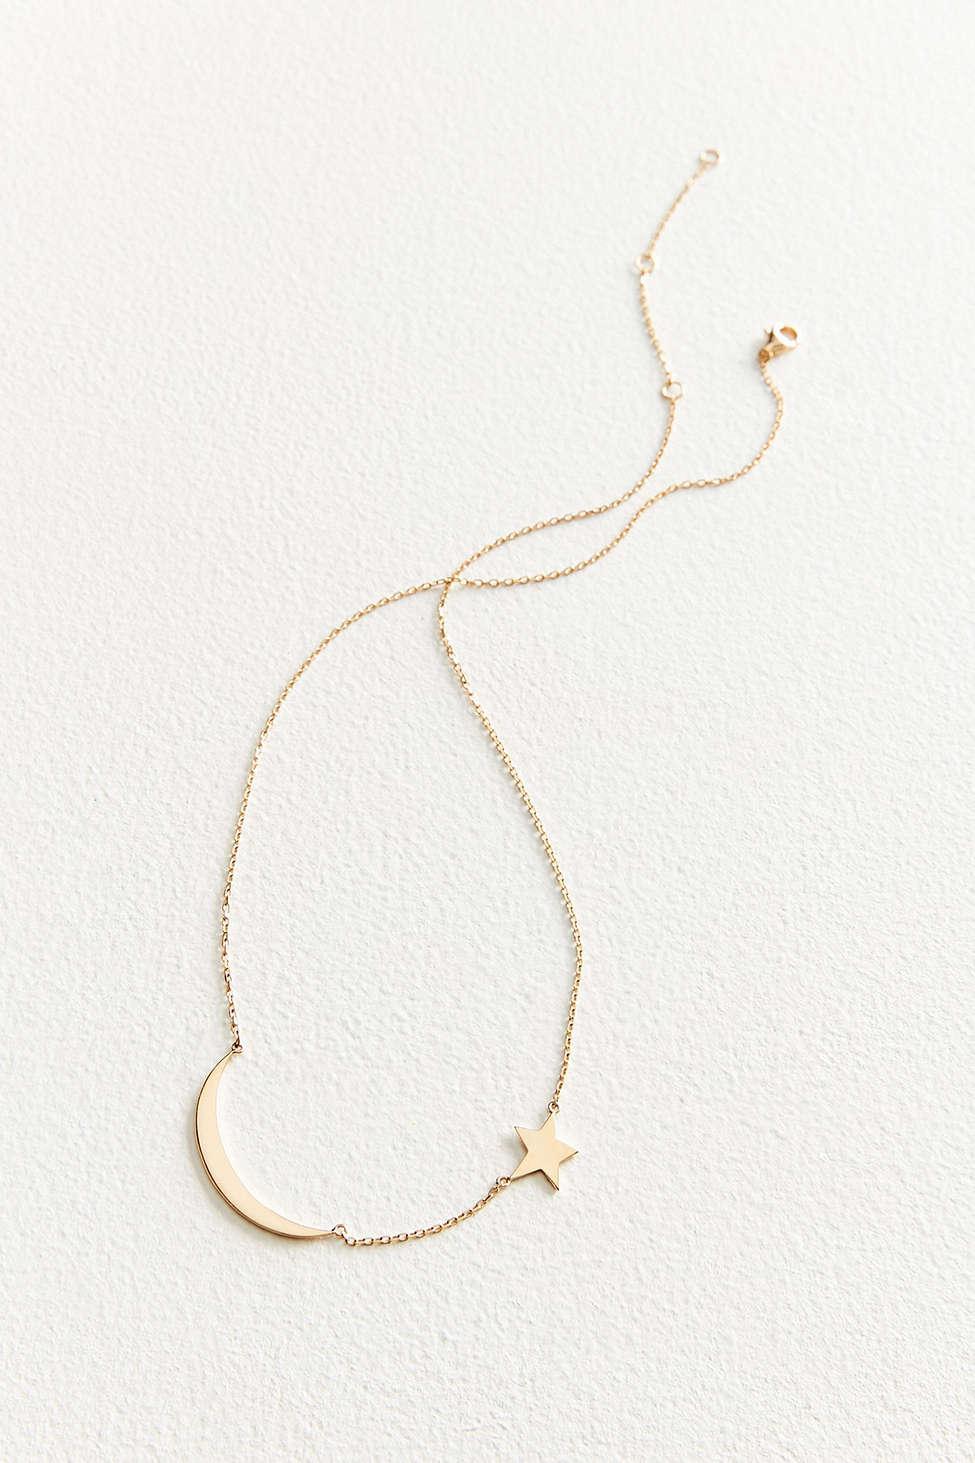 30c5ddb38 Jennifer Zeuner X Uo Moon Star Necklace in Metallic - Lyst